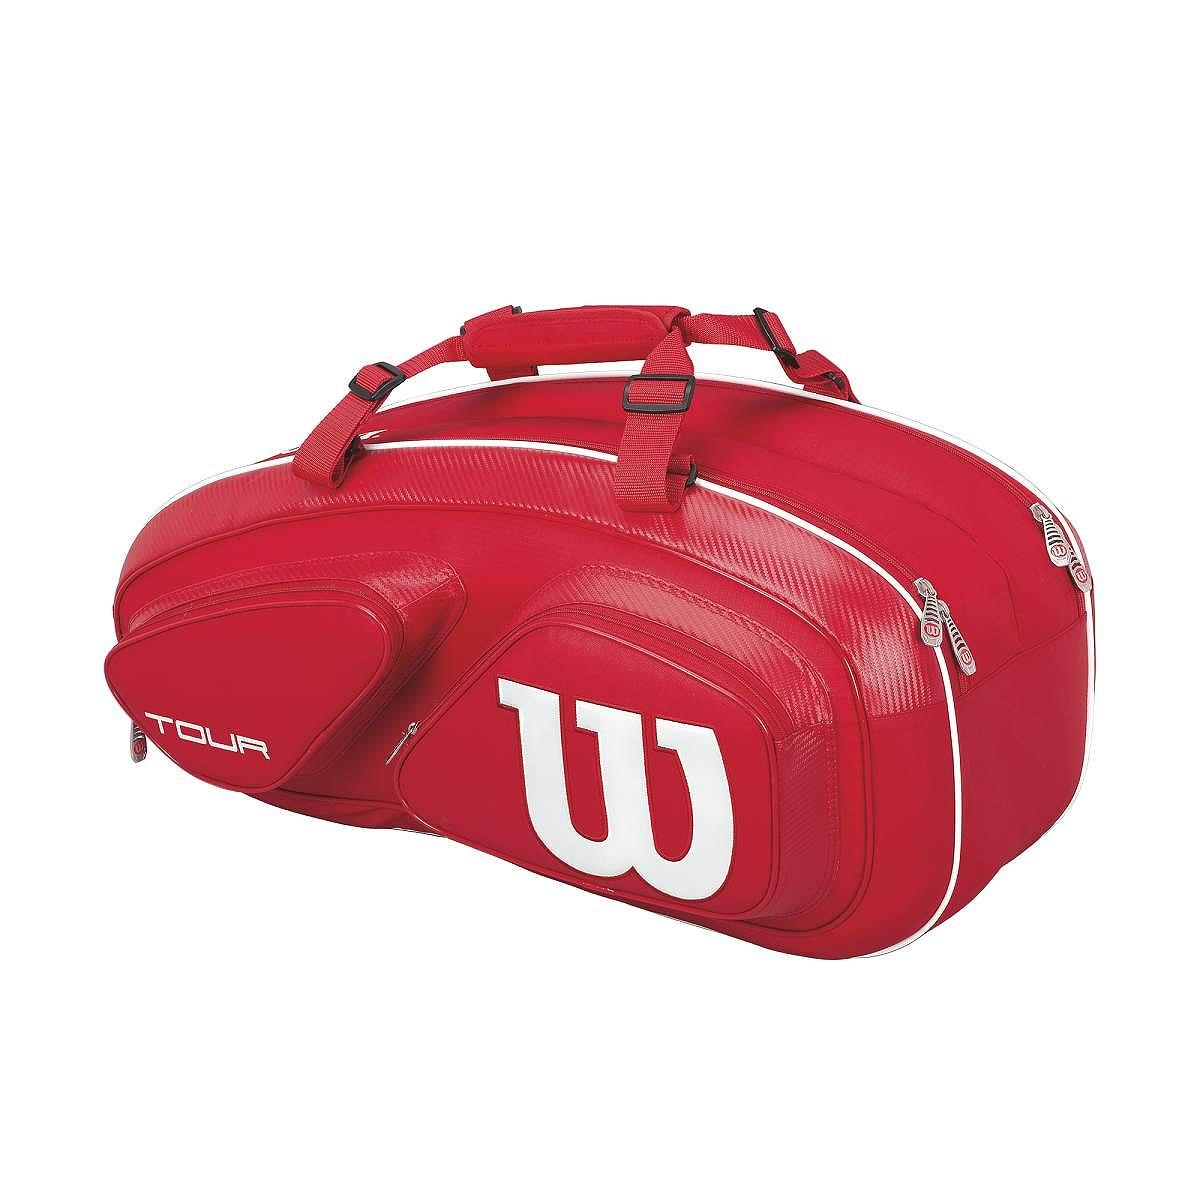 Wilson Tour red - 6 pack.jpg